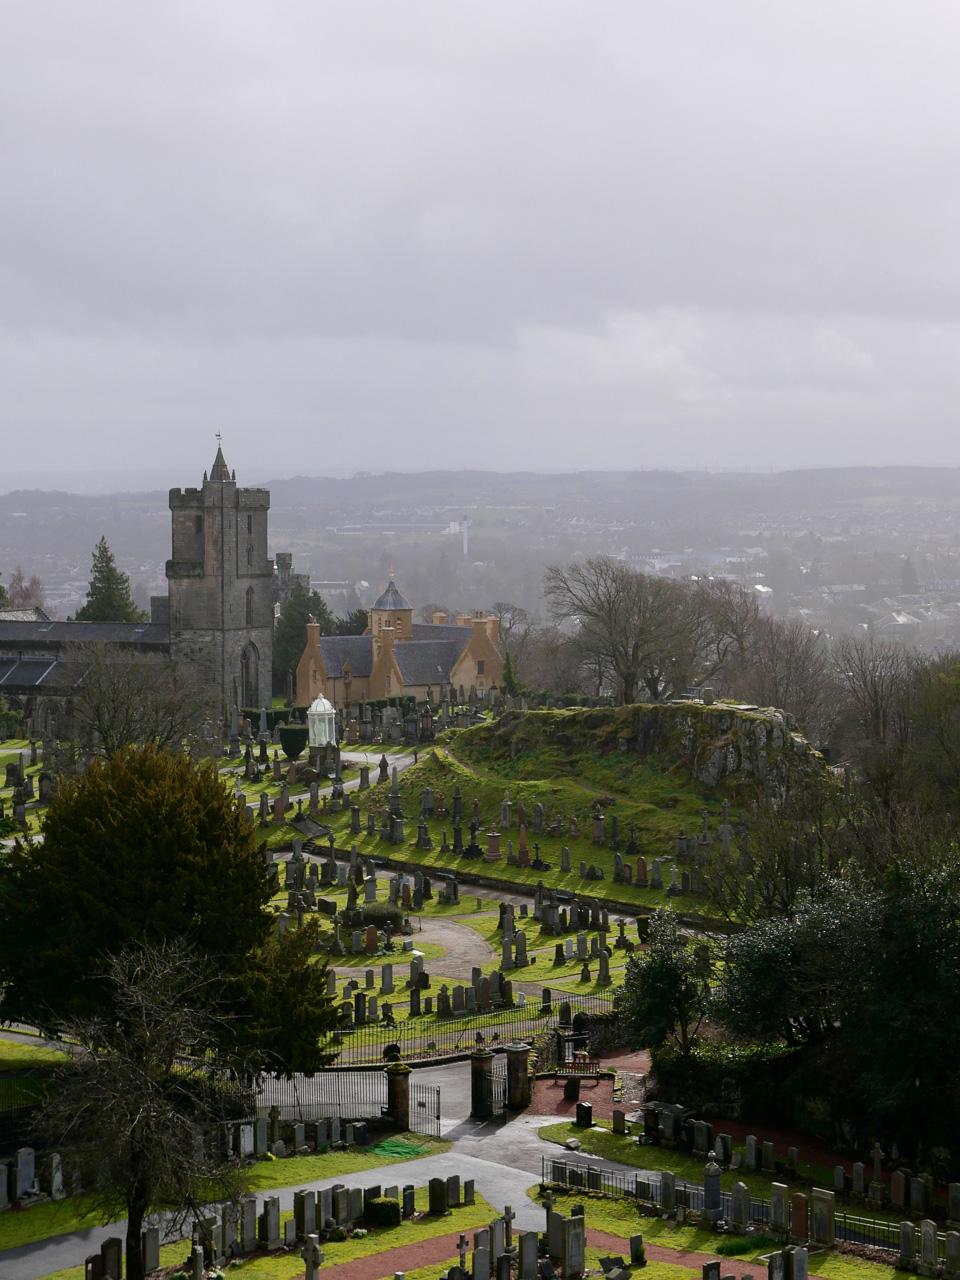 Cara Sharratt Travel - Stirling Castle - Scotland, United Kingdom